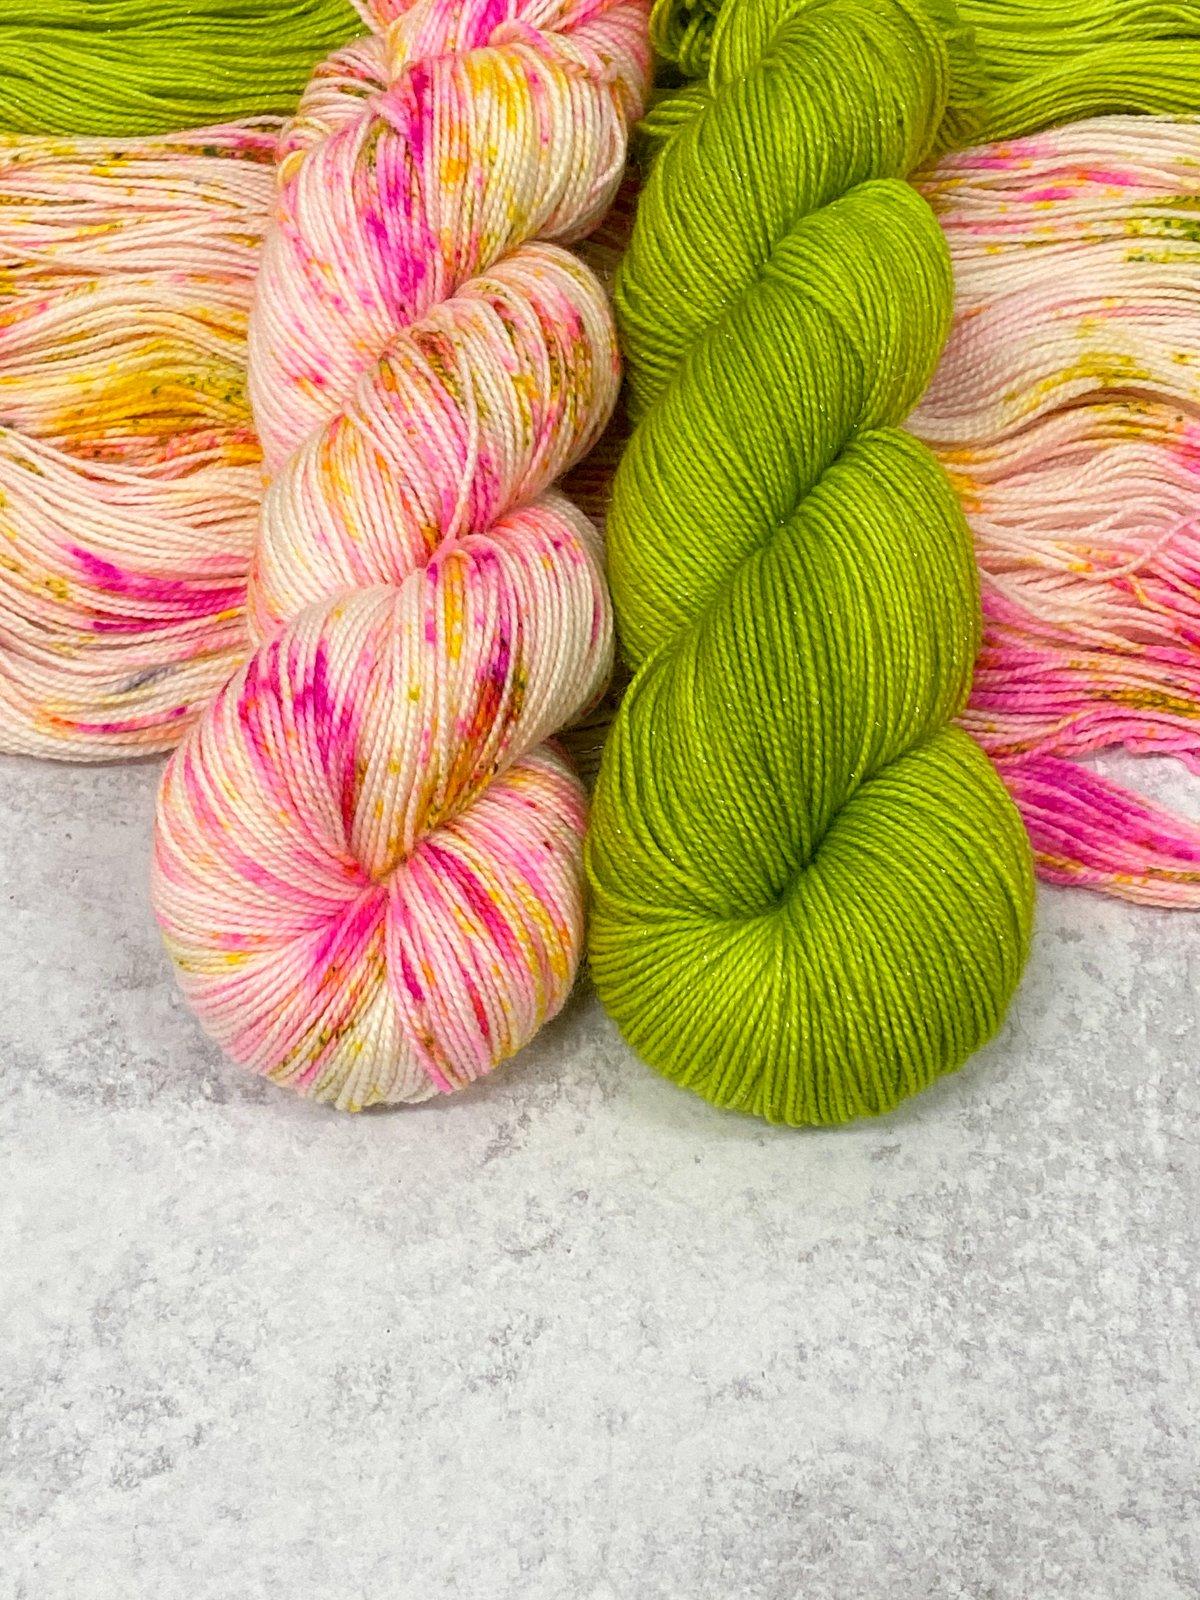 Casapinka Inspired Kits - Totally Rad Yarn